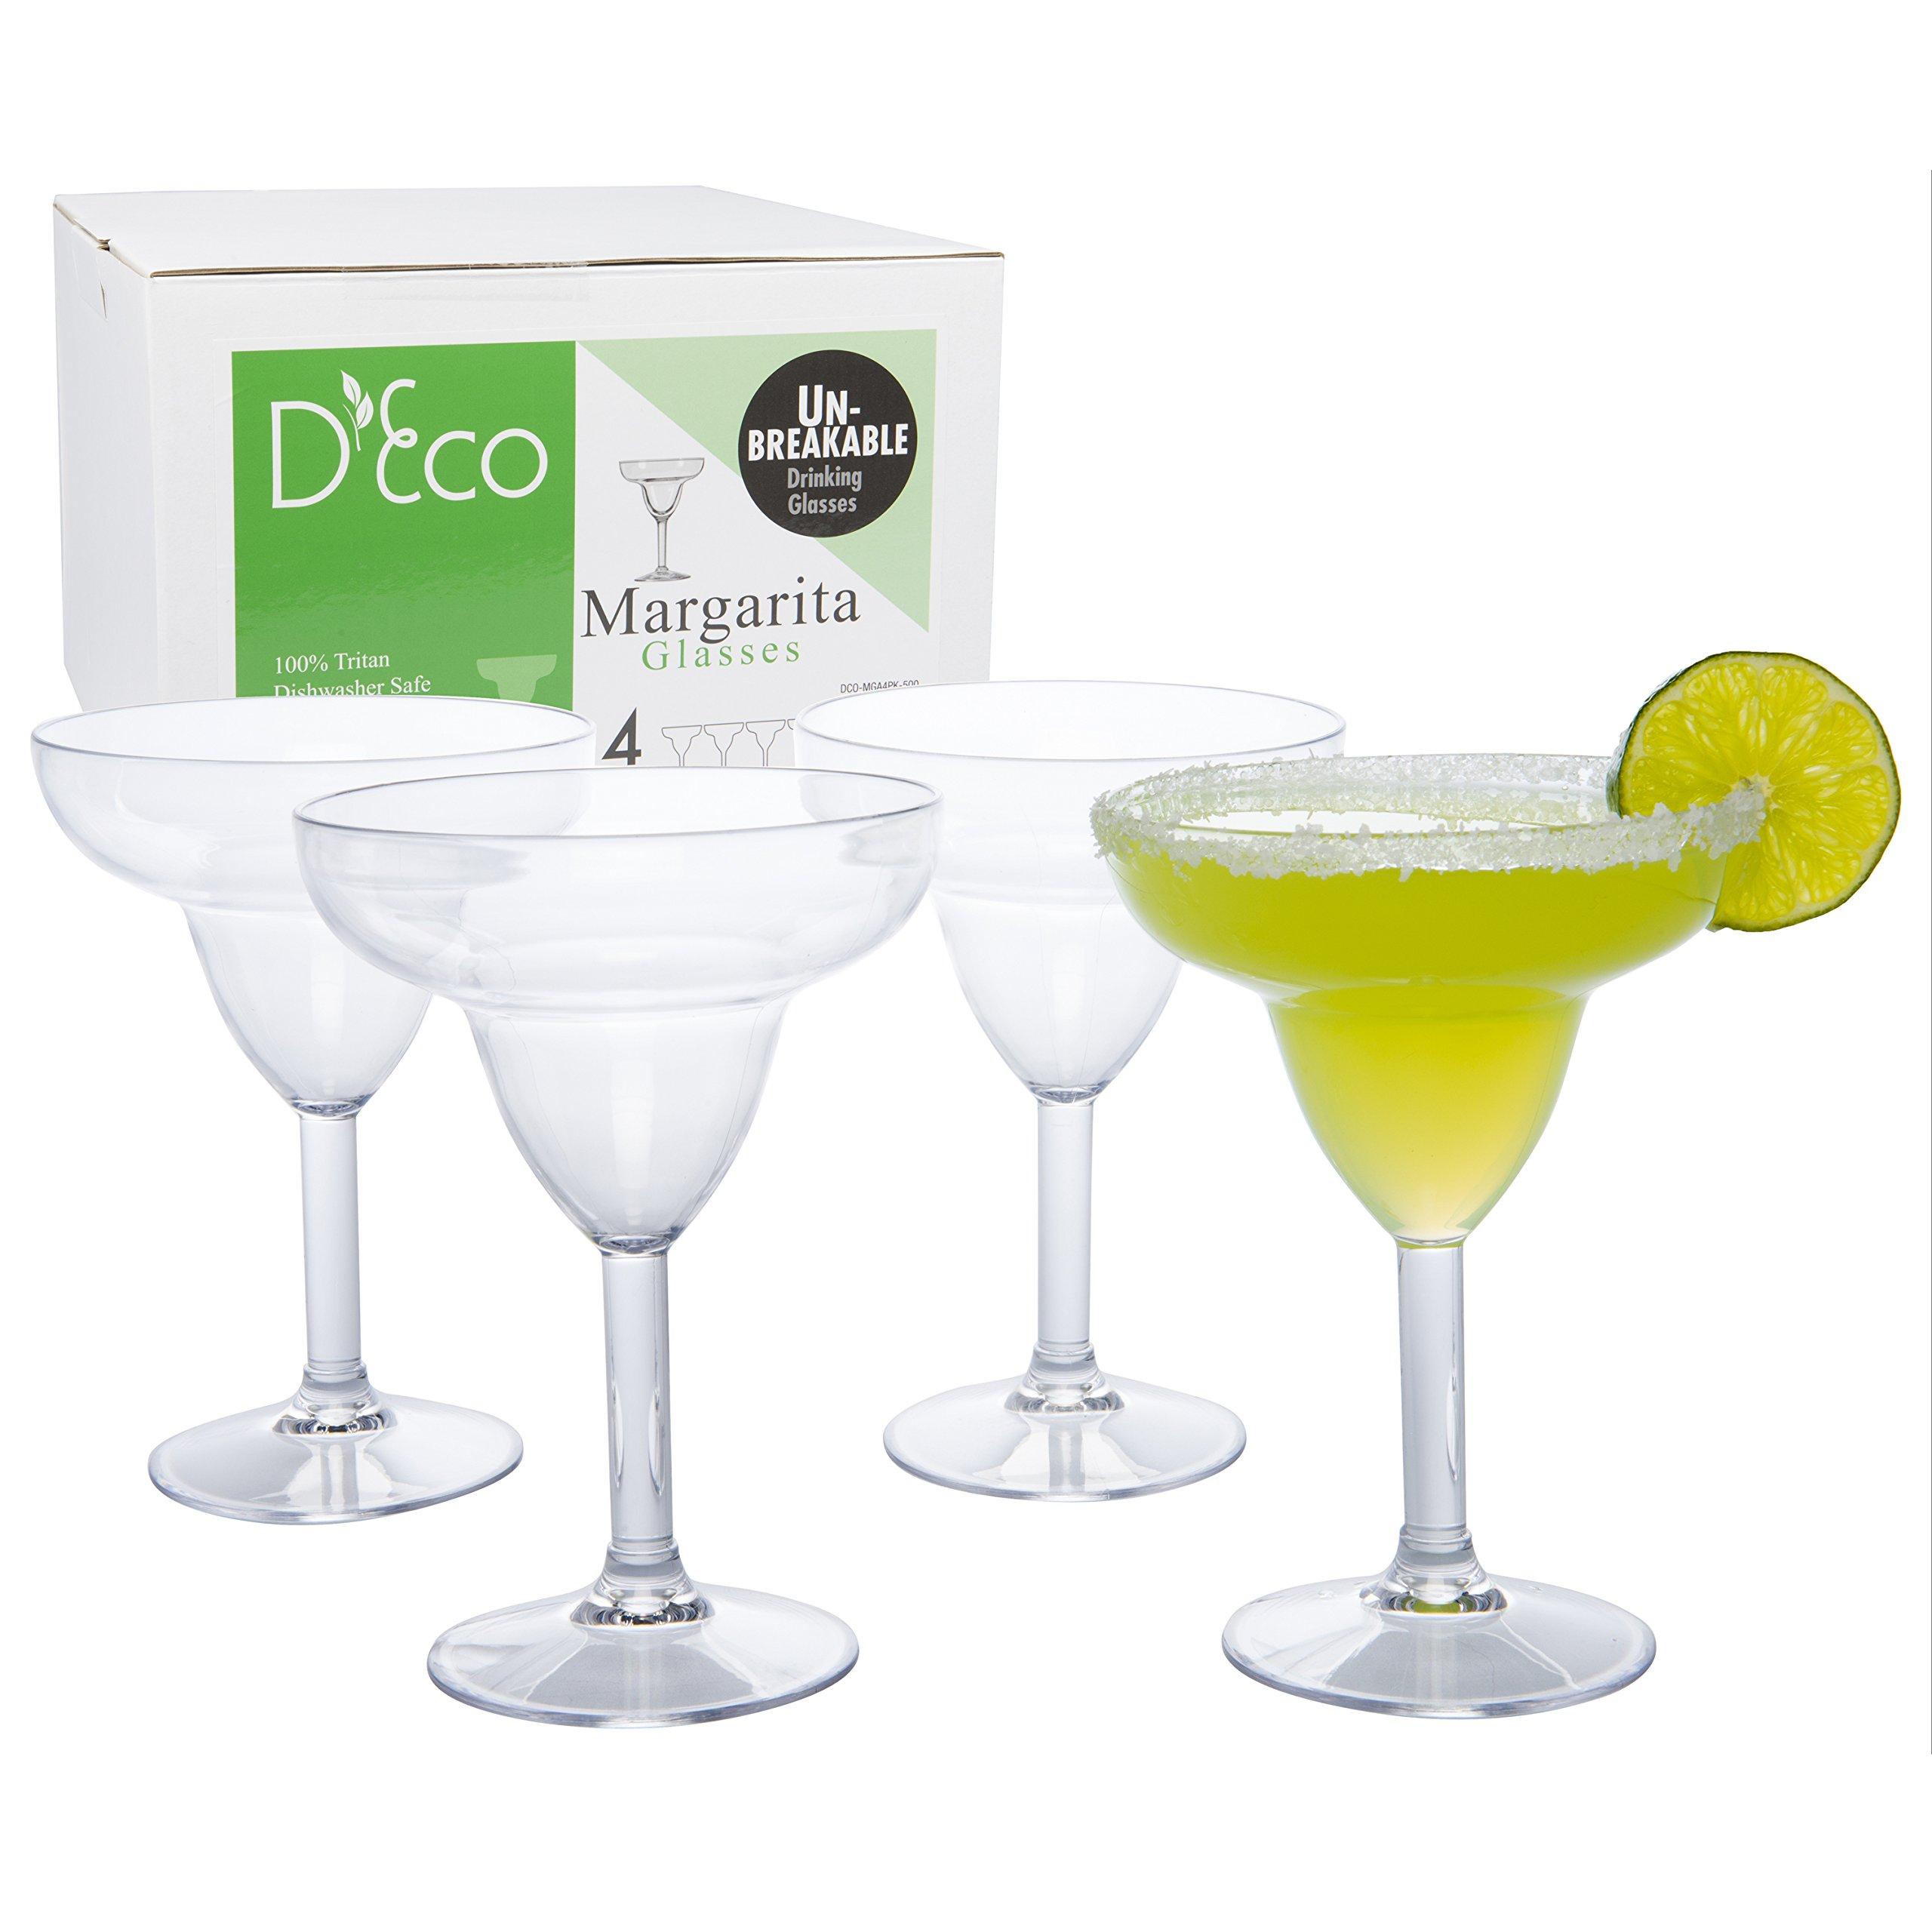 Unbreakable Margarita Glasses - 100% Tritan - Shatterproof, Reusable, Dishwasher Safe (Set of 4)